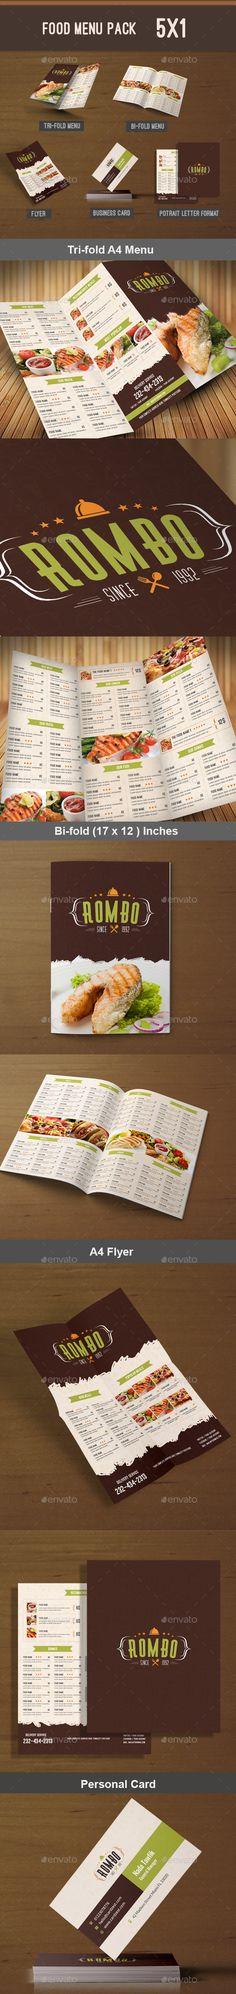 Budget Restaurant Menu Covers   Work    Menu Covers